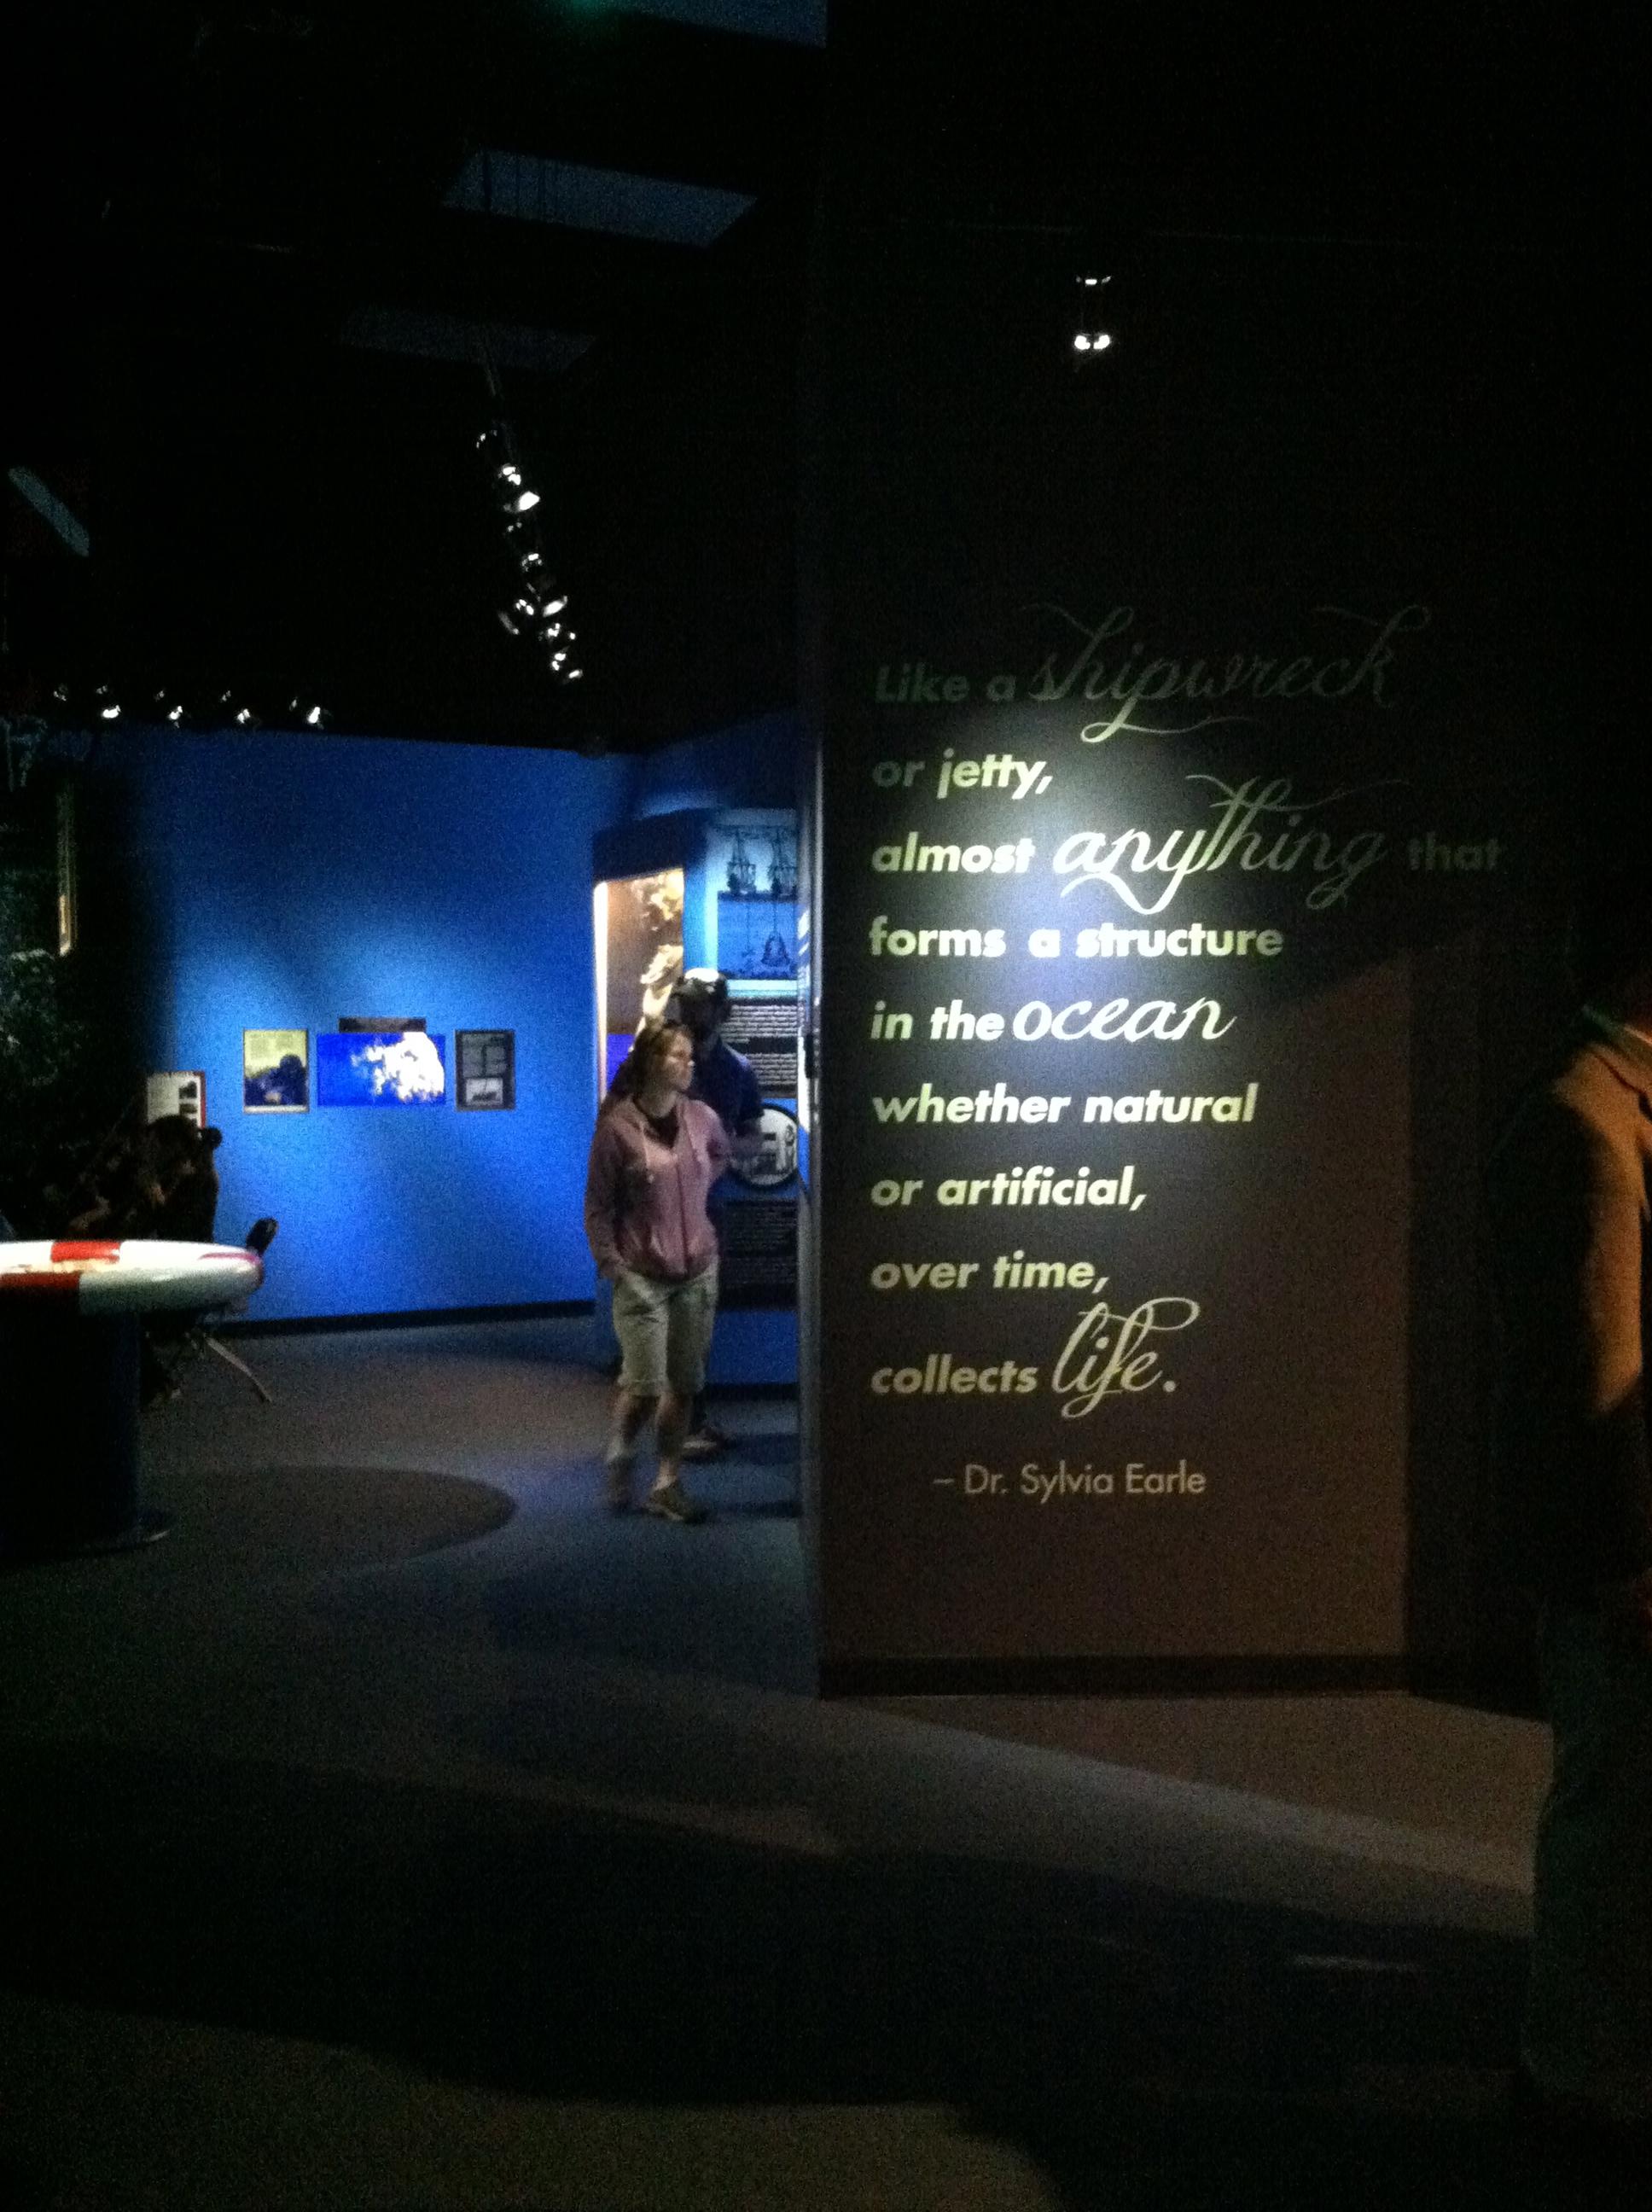 Exhibit Entrance Wall